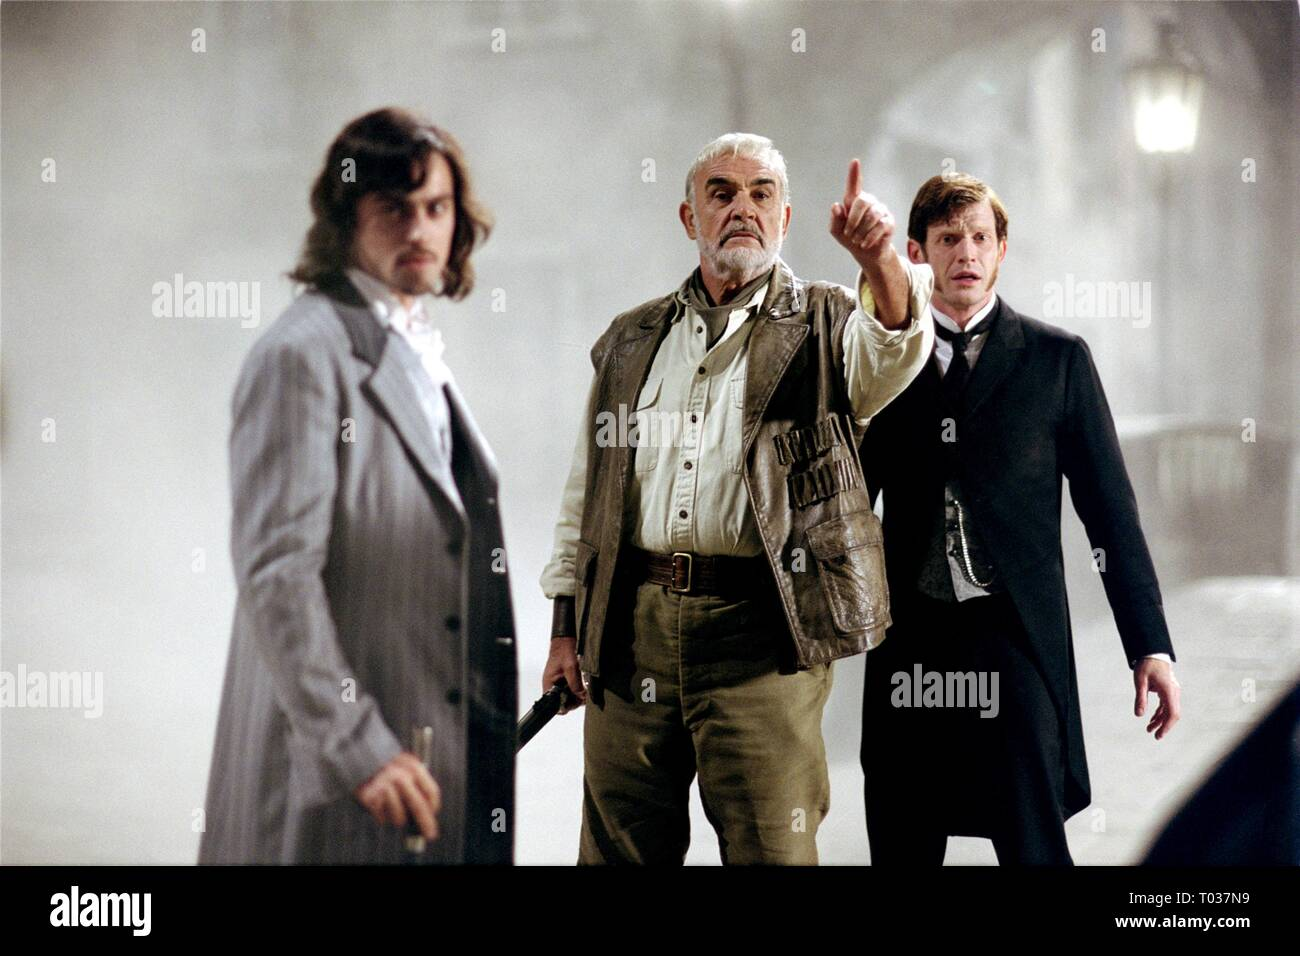 STUART TOWNSEND, SEAN CONNERY, JASON FLEMYNG, THE LEAGUE OF EXTRAORDINARY GENTLEMEN, 2003 - Stock Image